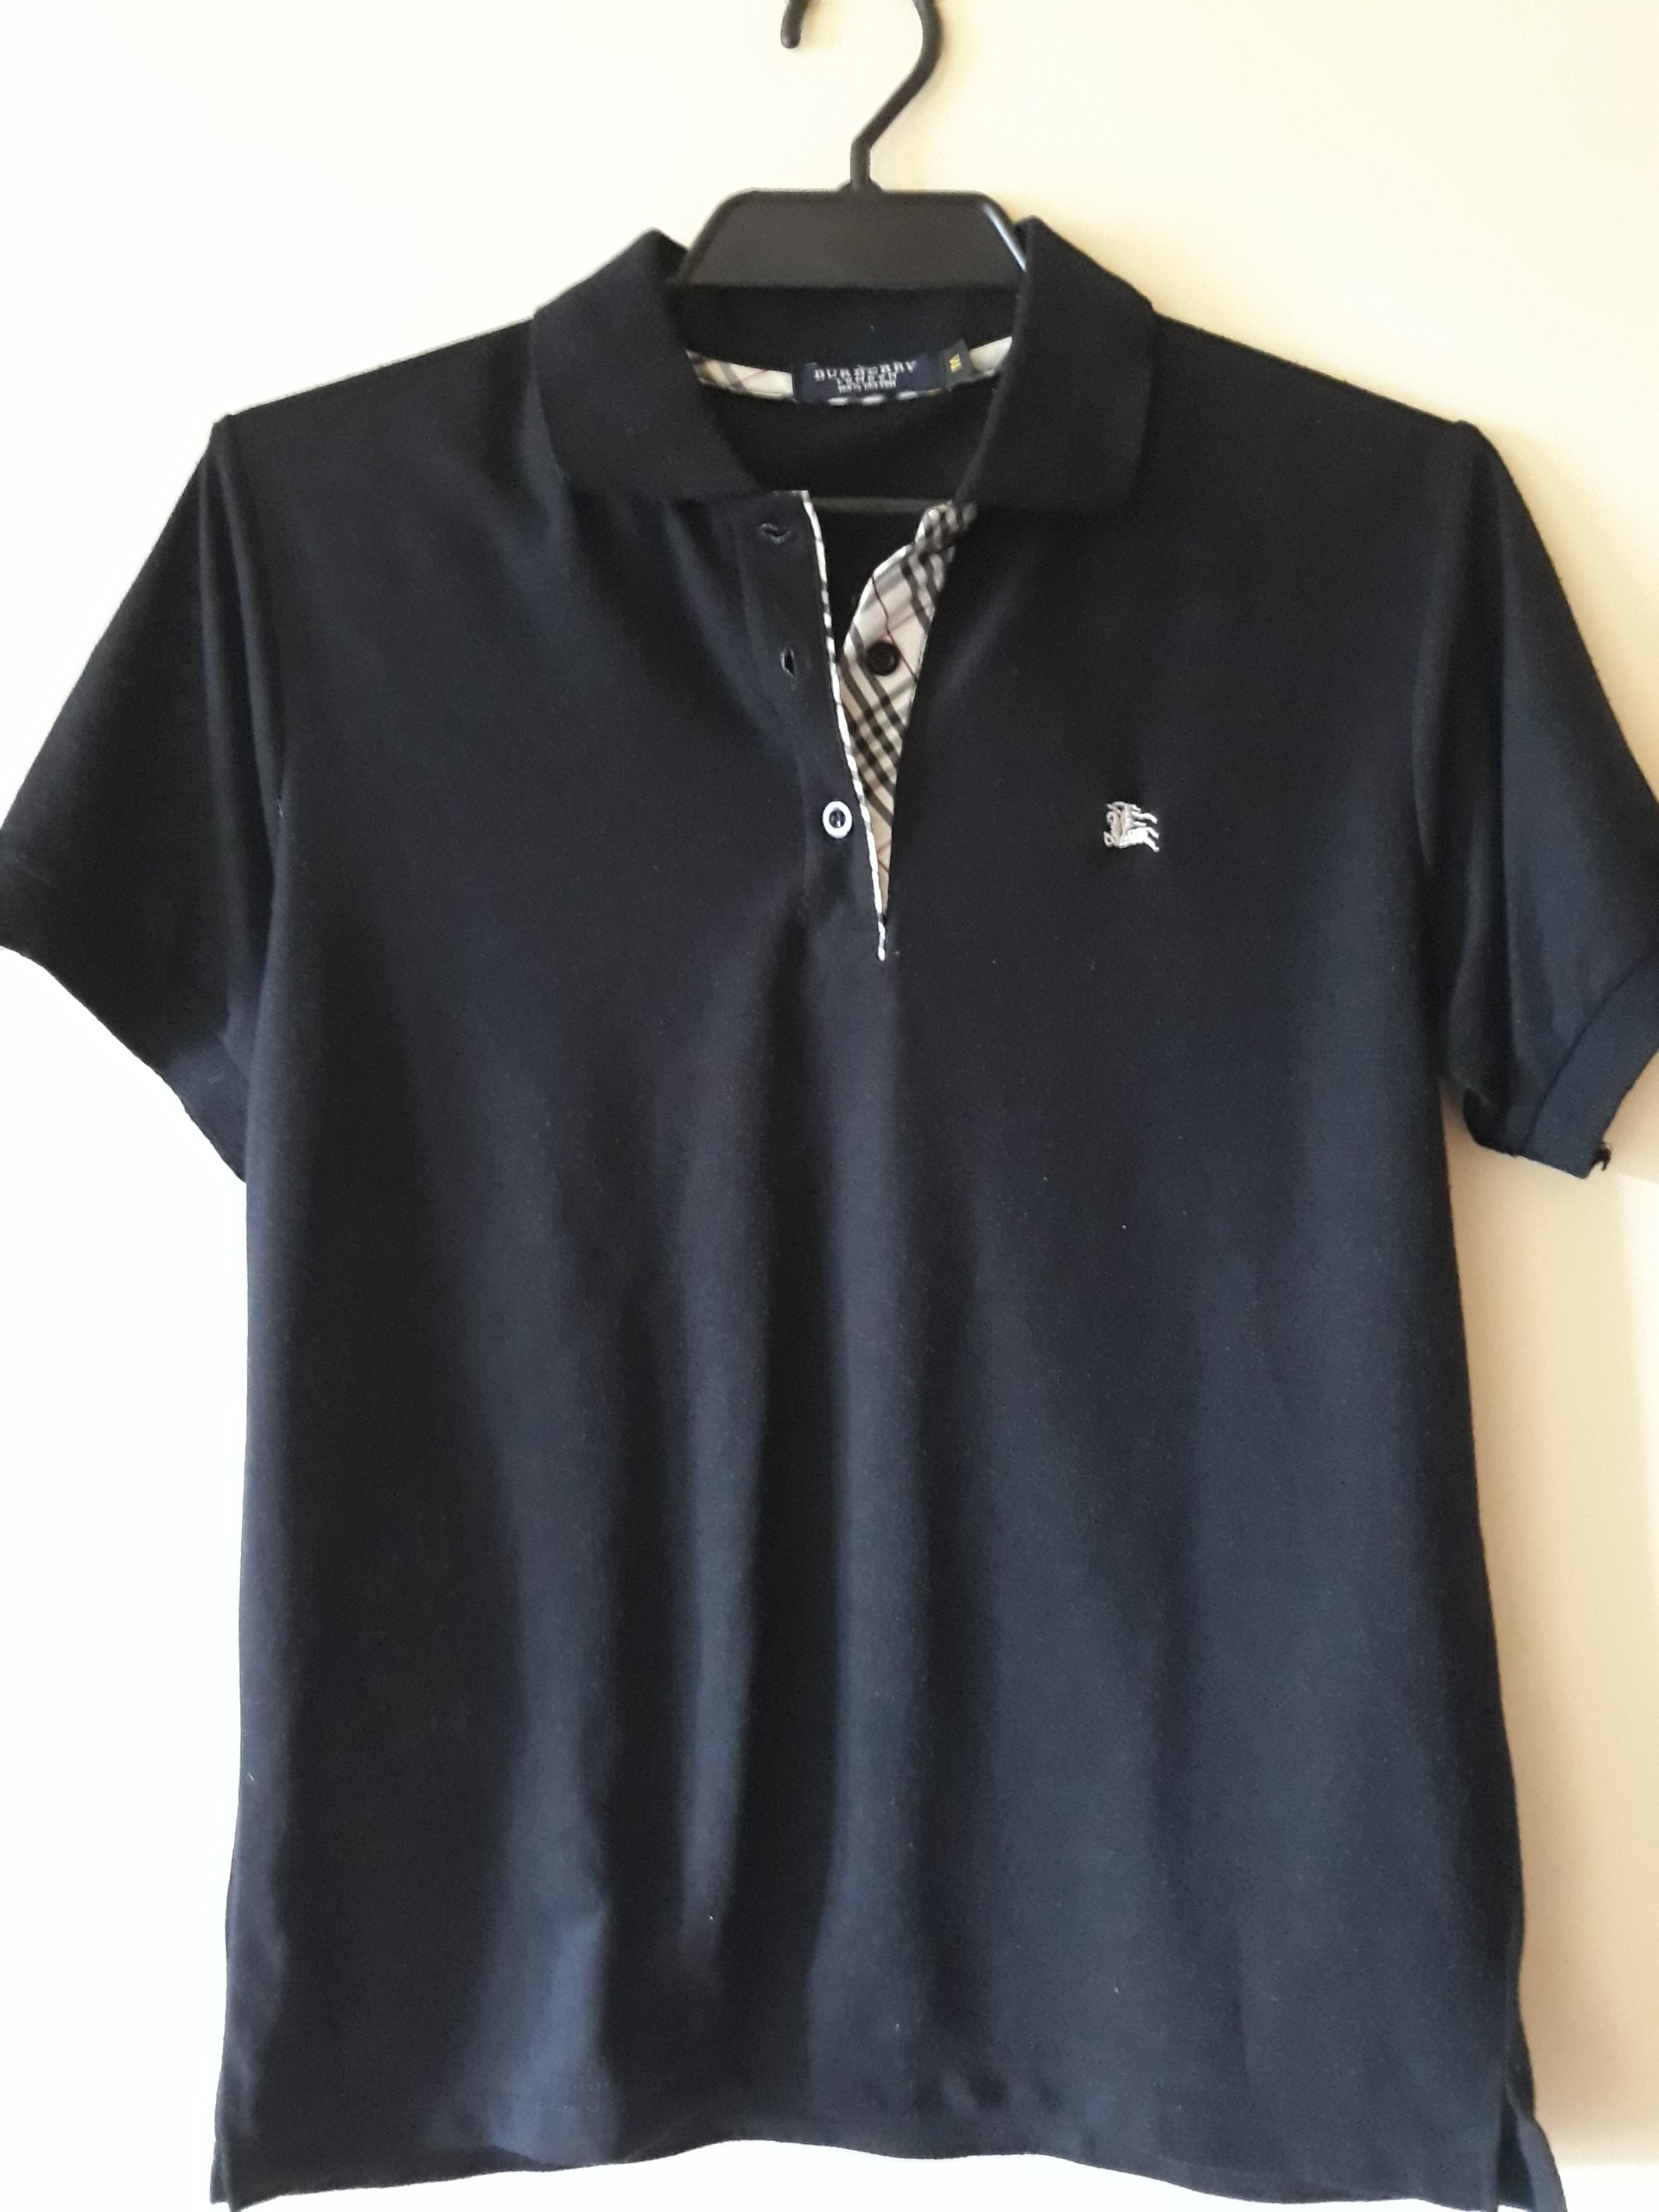 41fcdcff1 Koszulka polo Burberry M/L - 7468838649 - oficjalne archiwum allegro